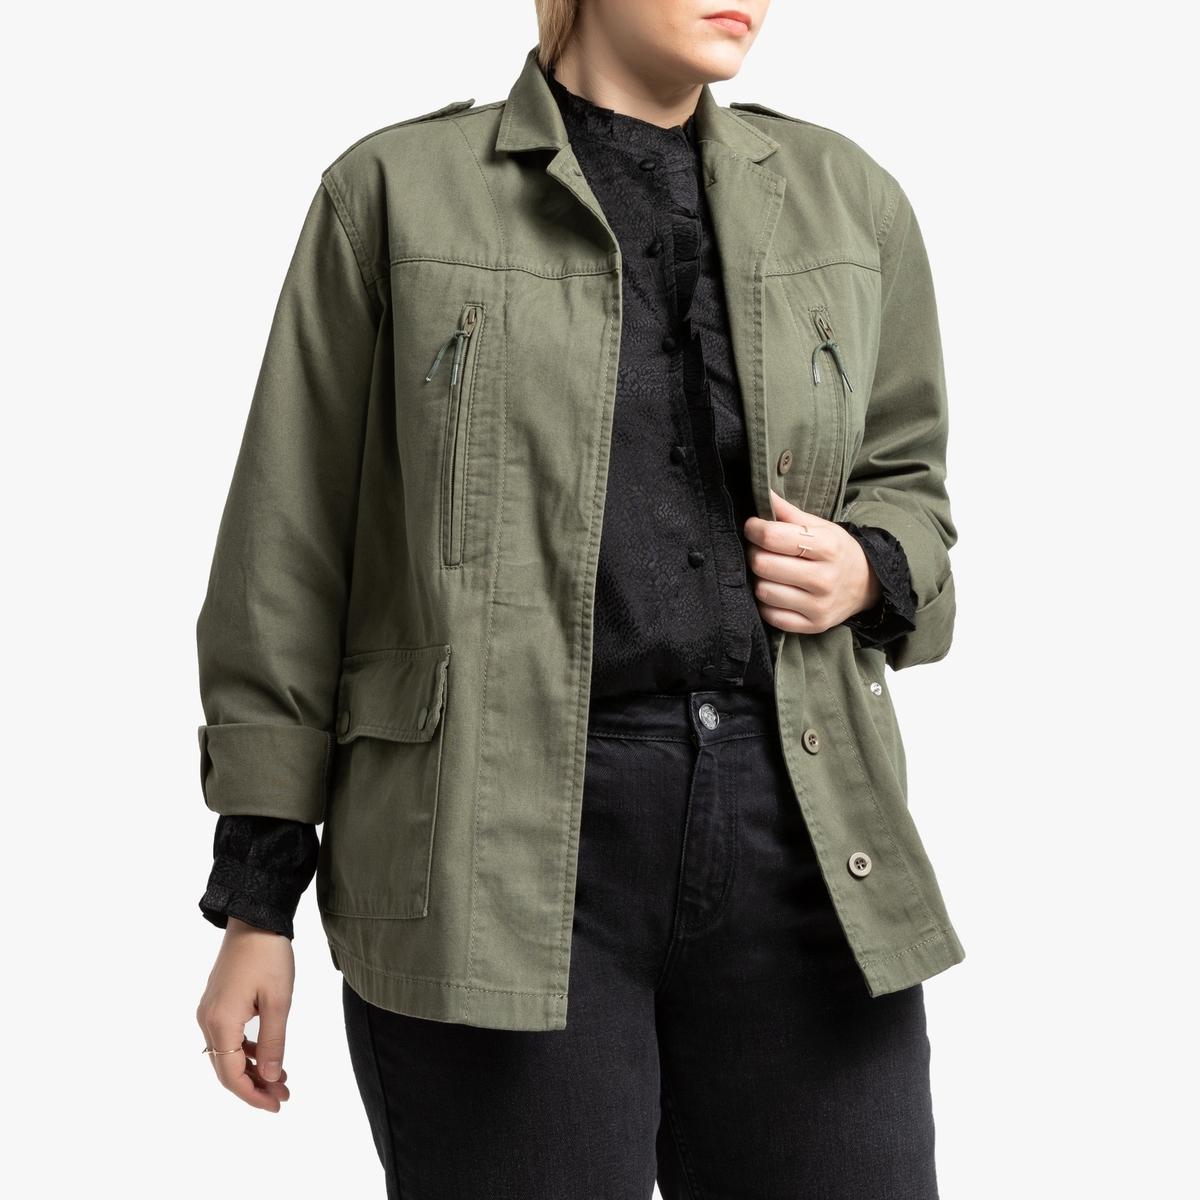 Жакет La Redoute В стиле милитари 52 (FR) - 58 (RUS) зеленый цены онлайн